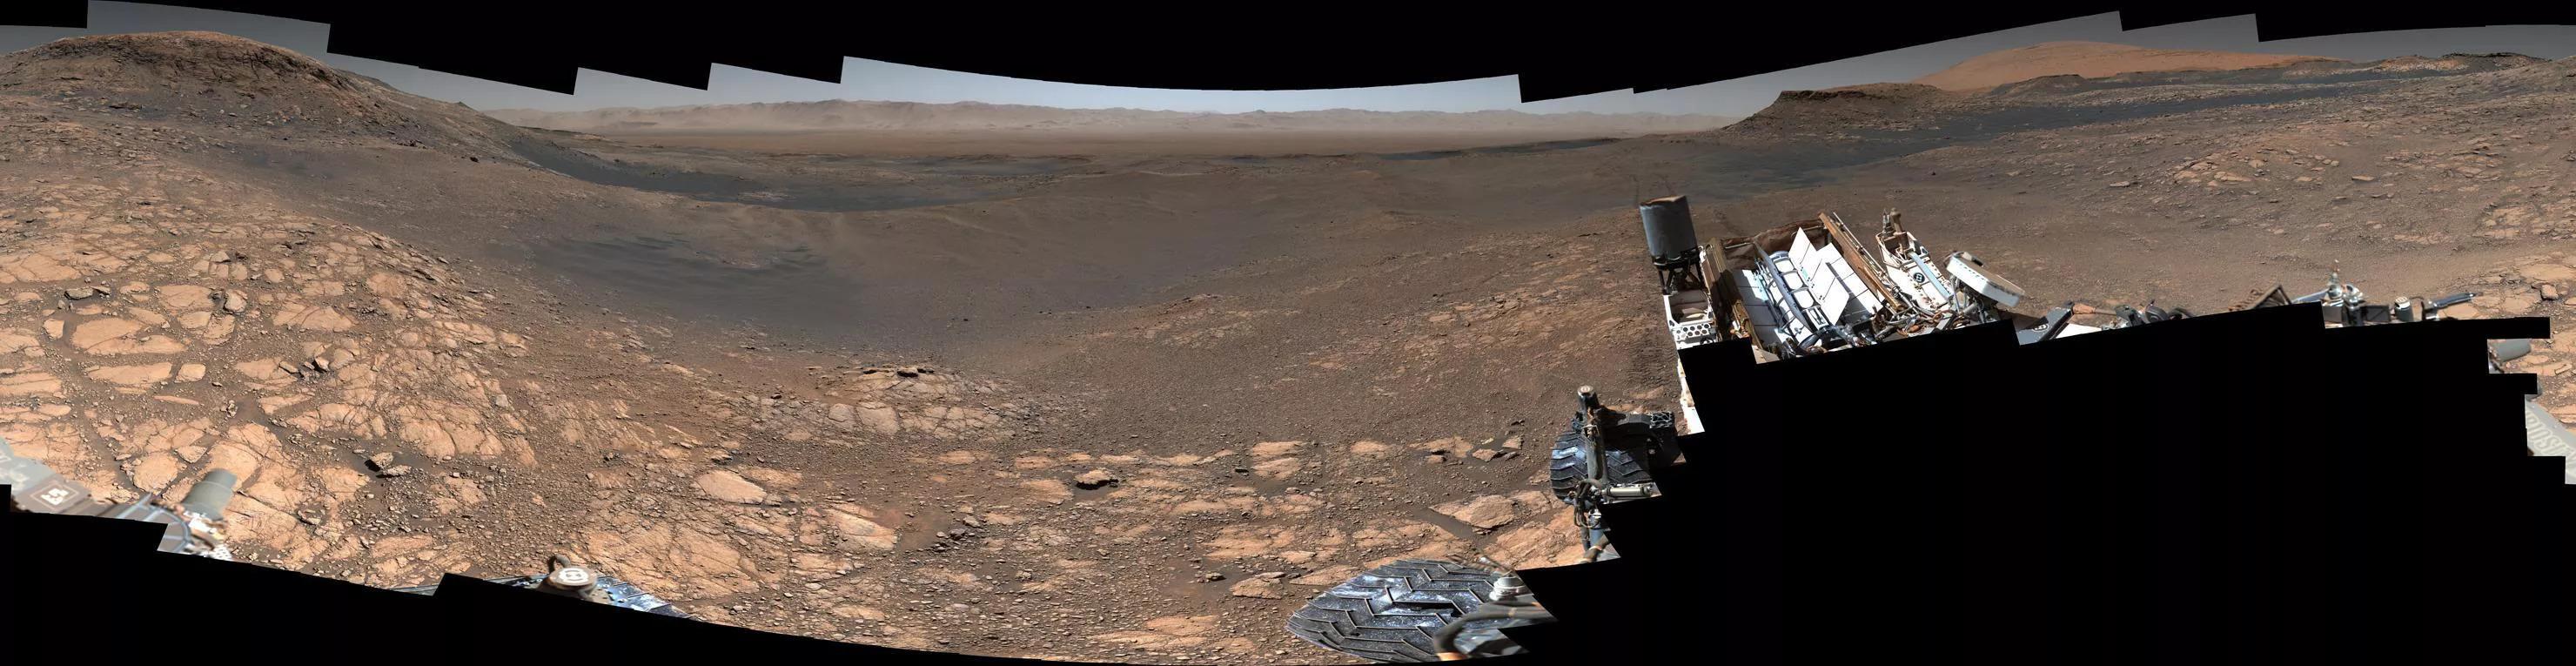 NASA公布纪念性火星全景图 高达180亿像素